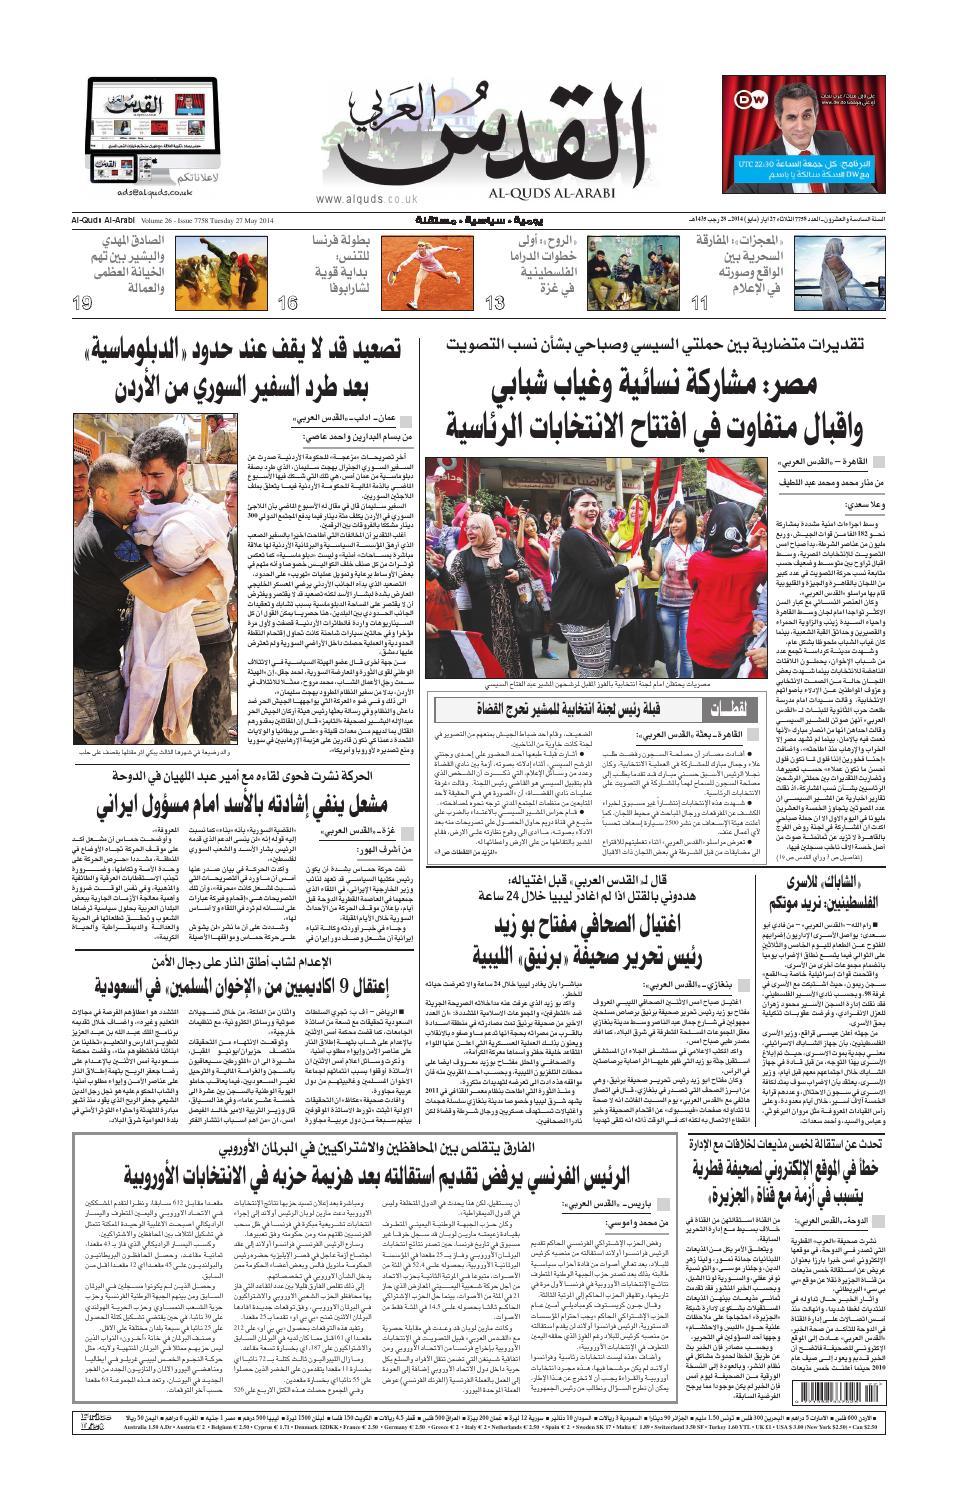 cc42f3d3a صحيفة القدس العربي , الثلاثاء 27.05.2014 by مركز الحدث - issuu